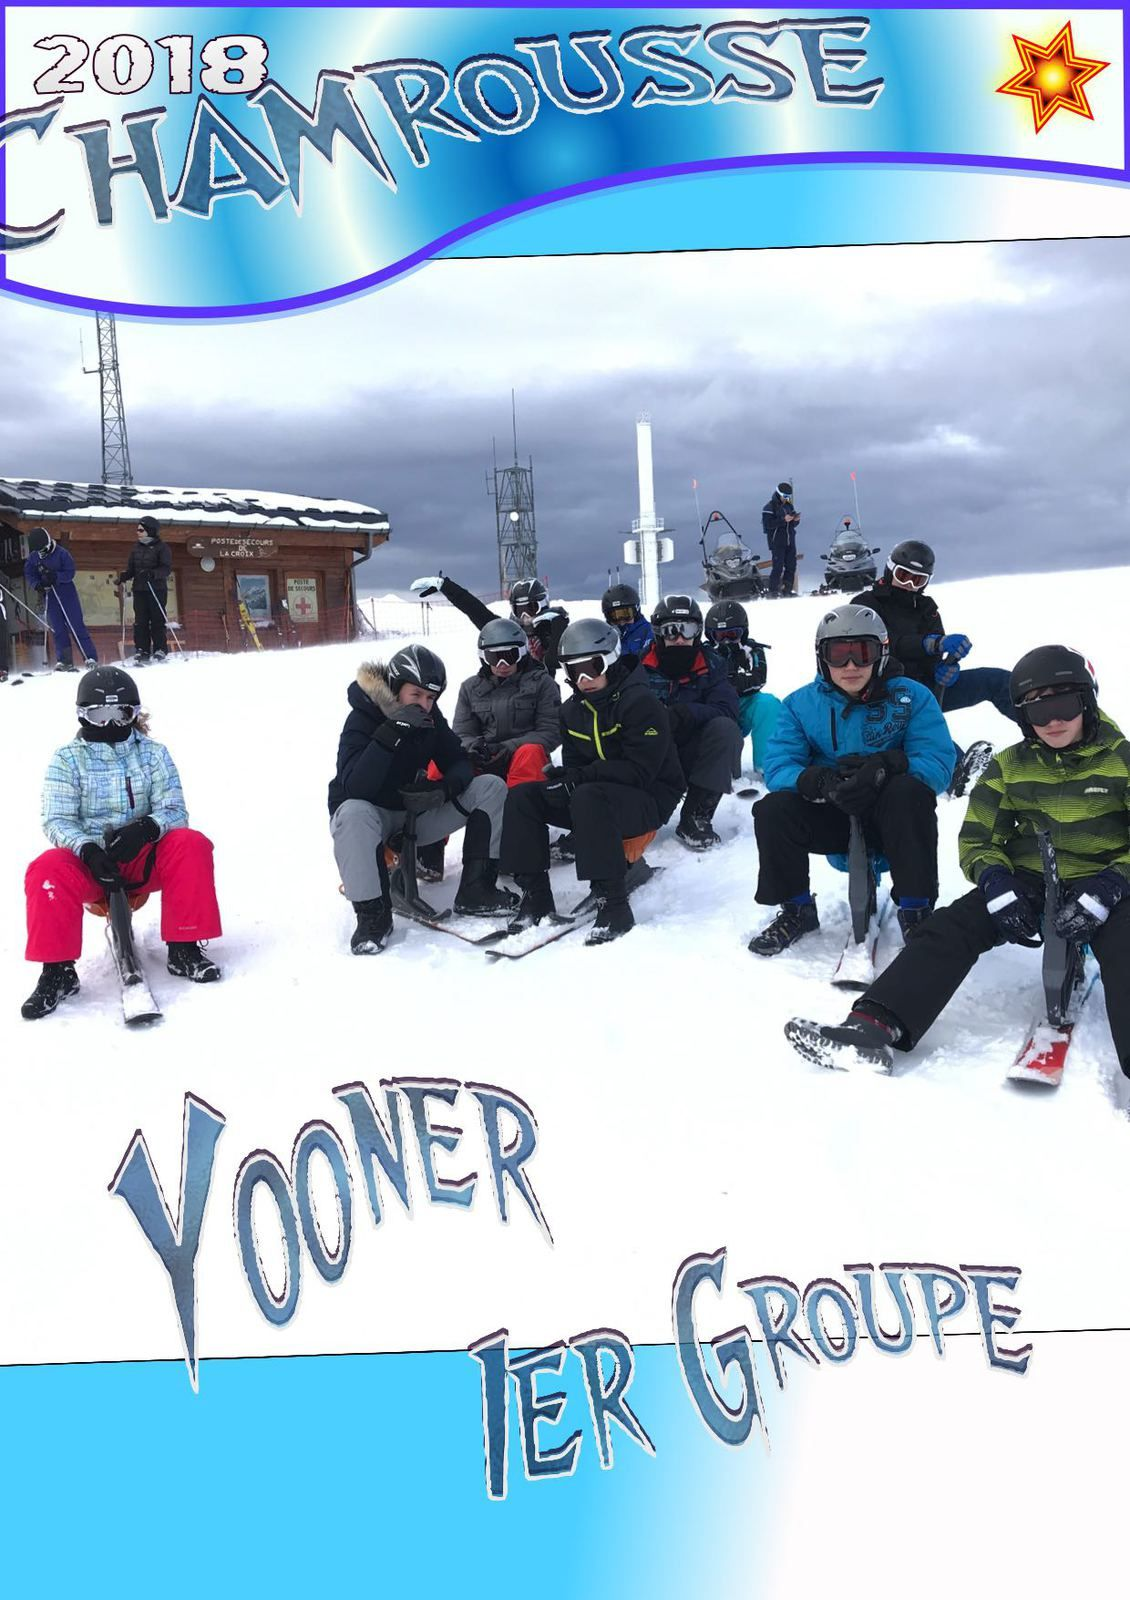 Yooner 1er groupe